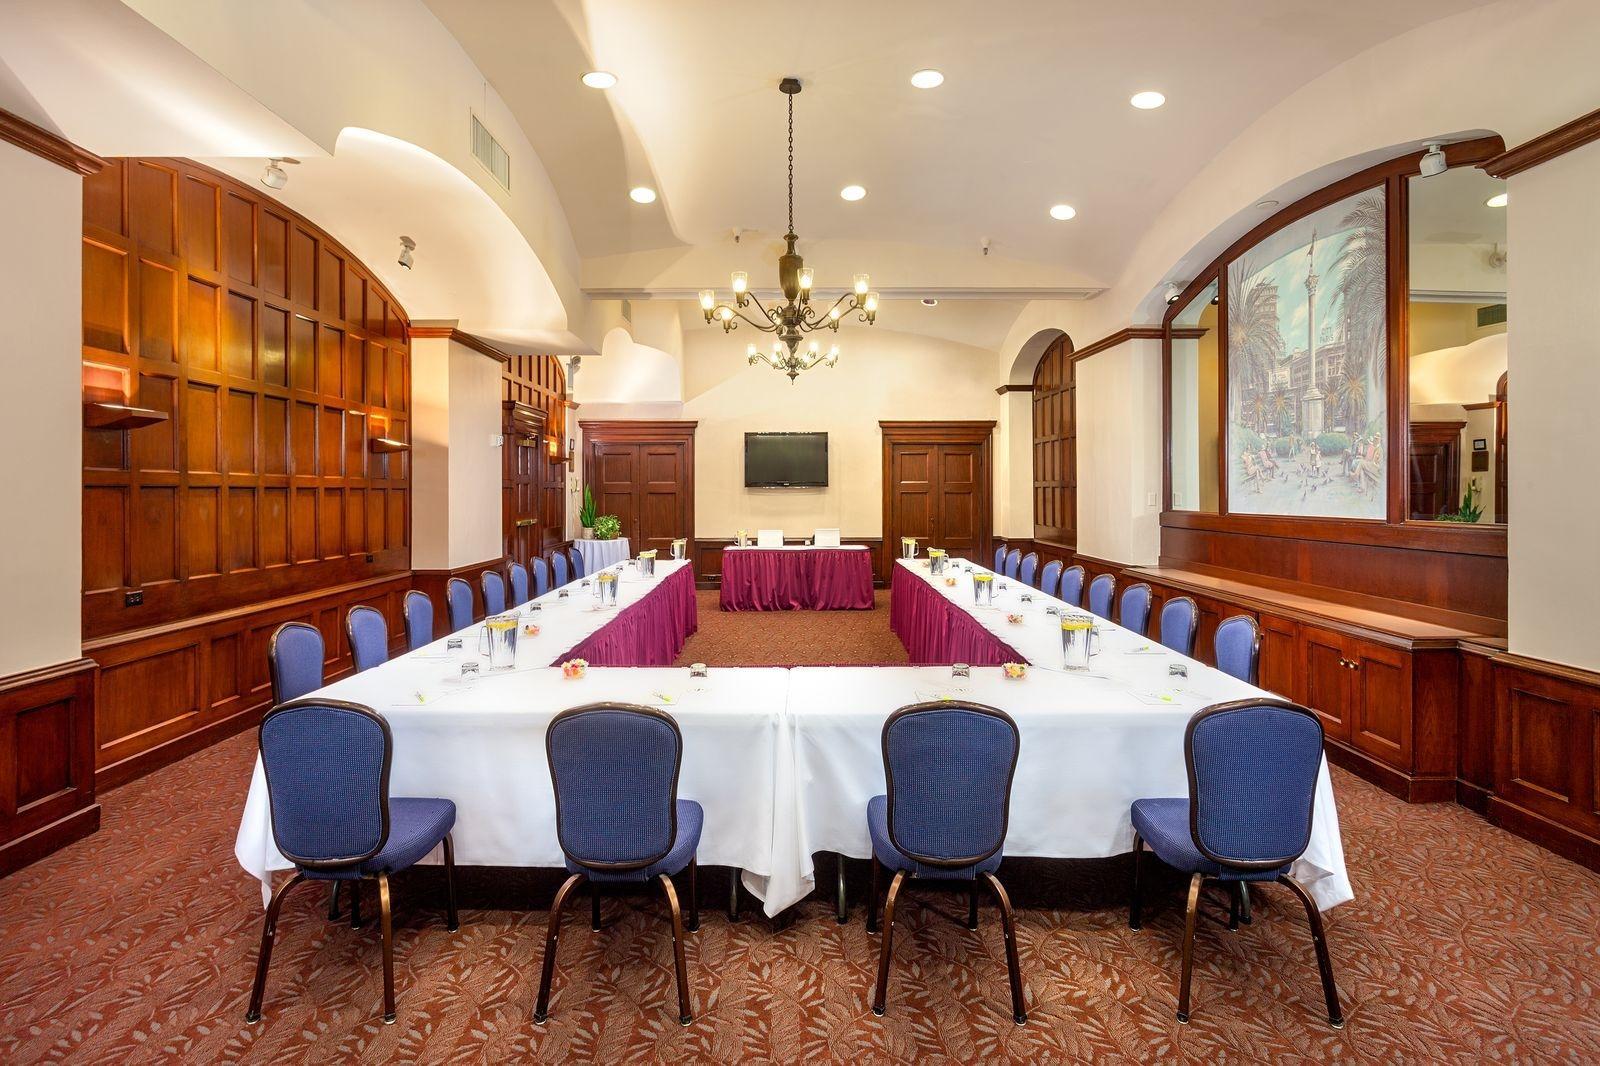 Union Square Meeting Room